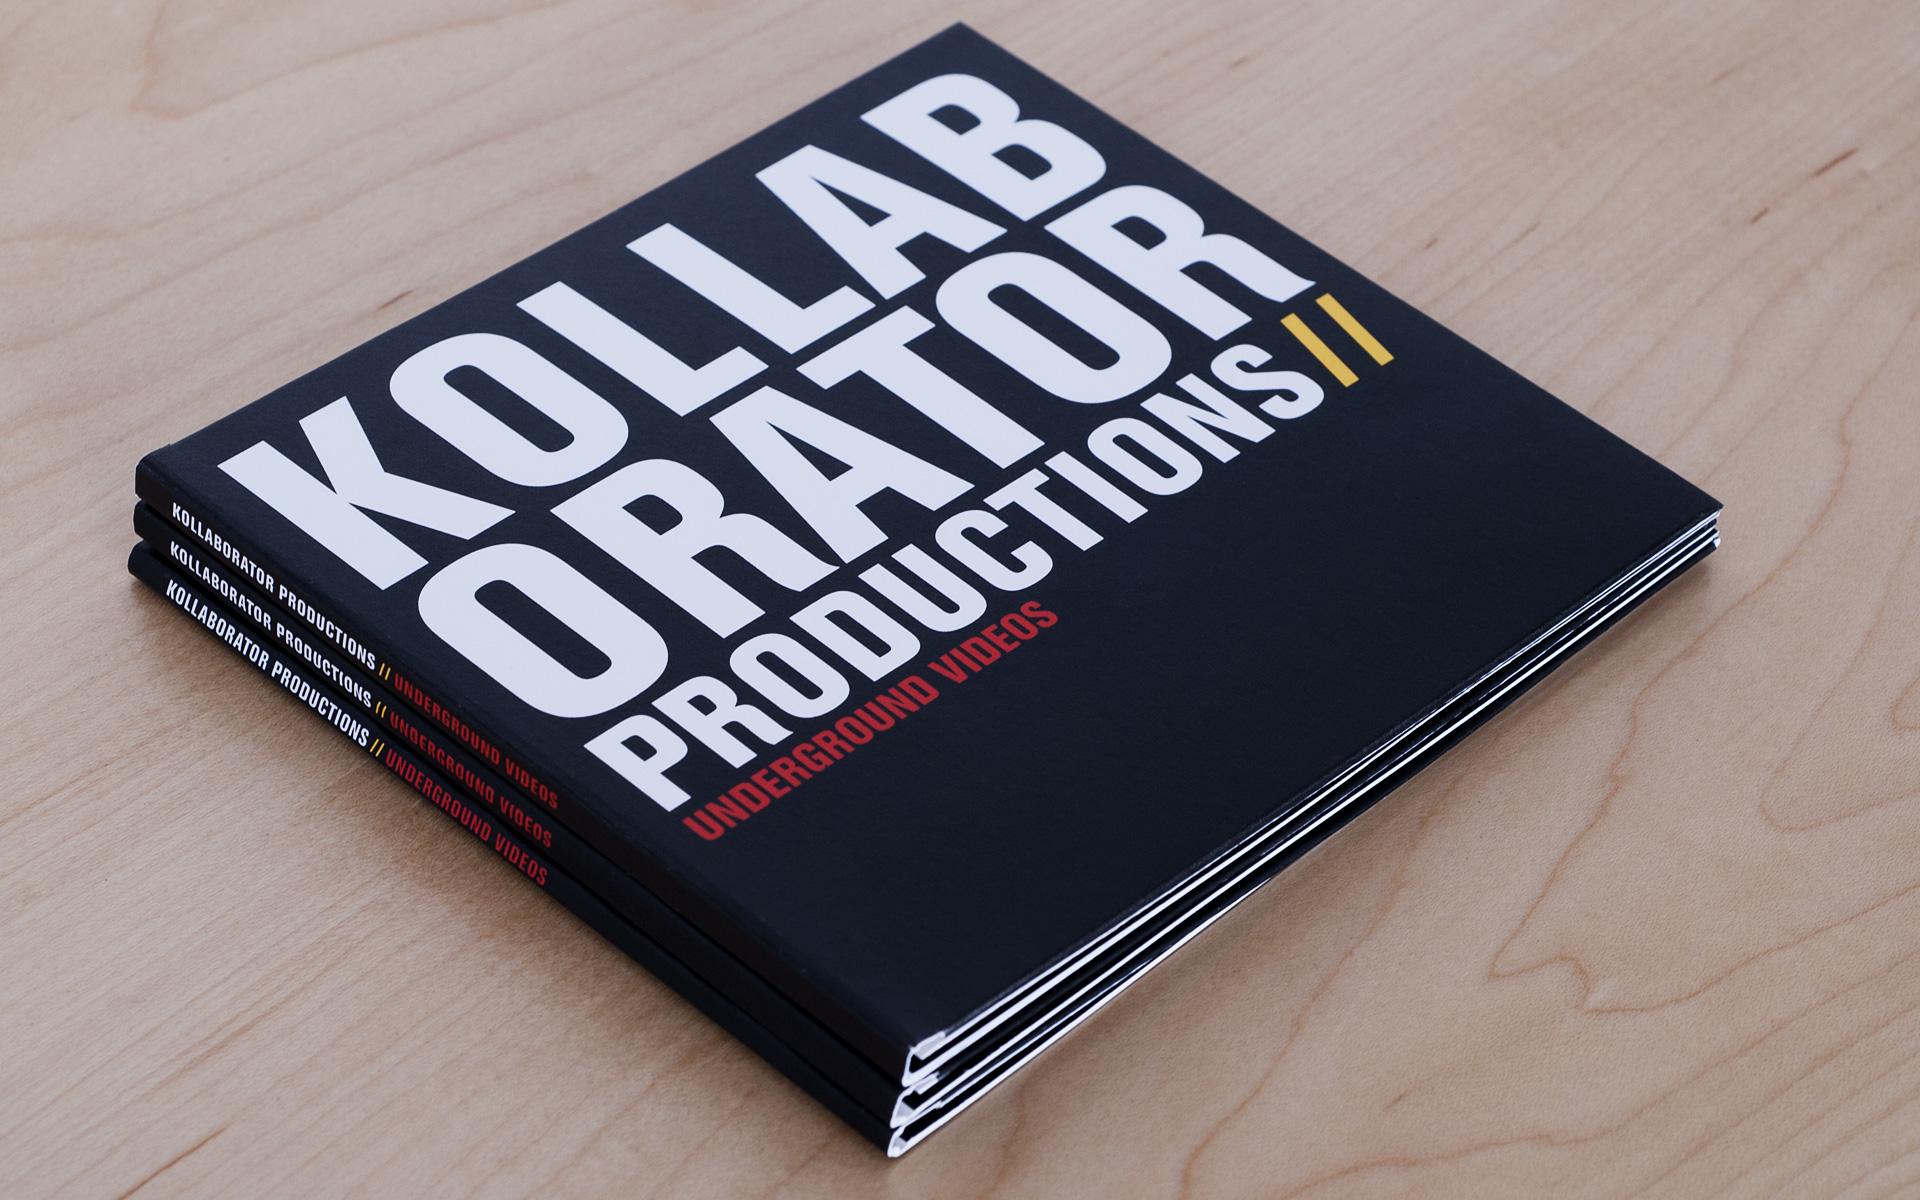 Kollaborators_Underground_Cover